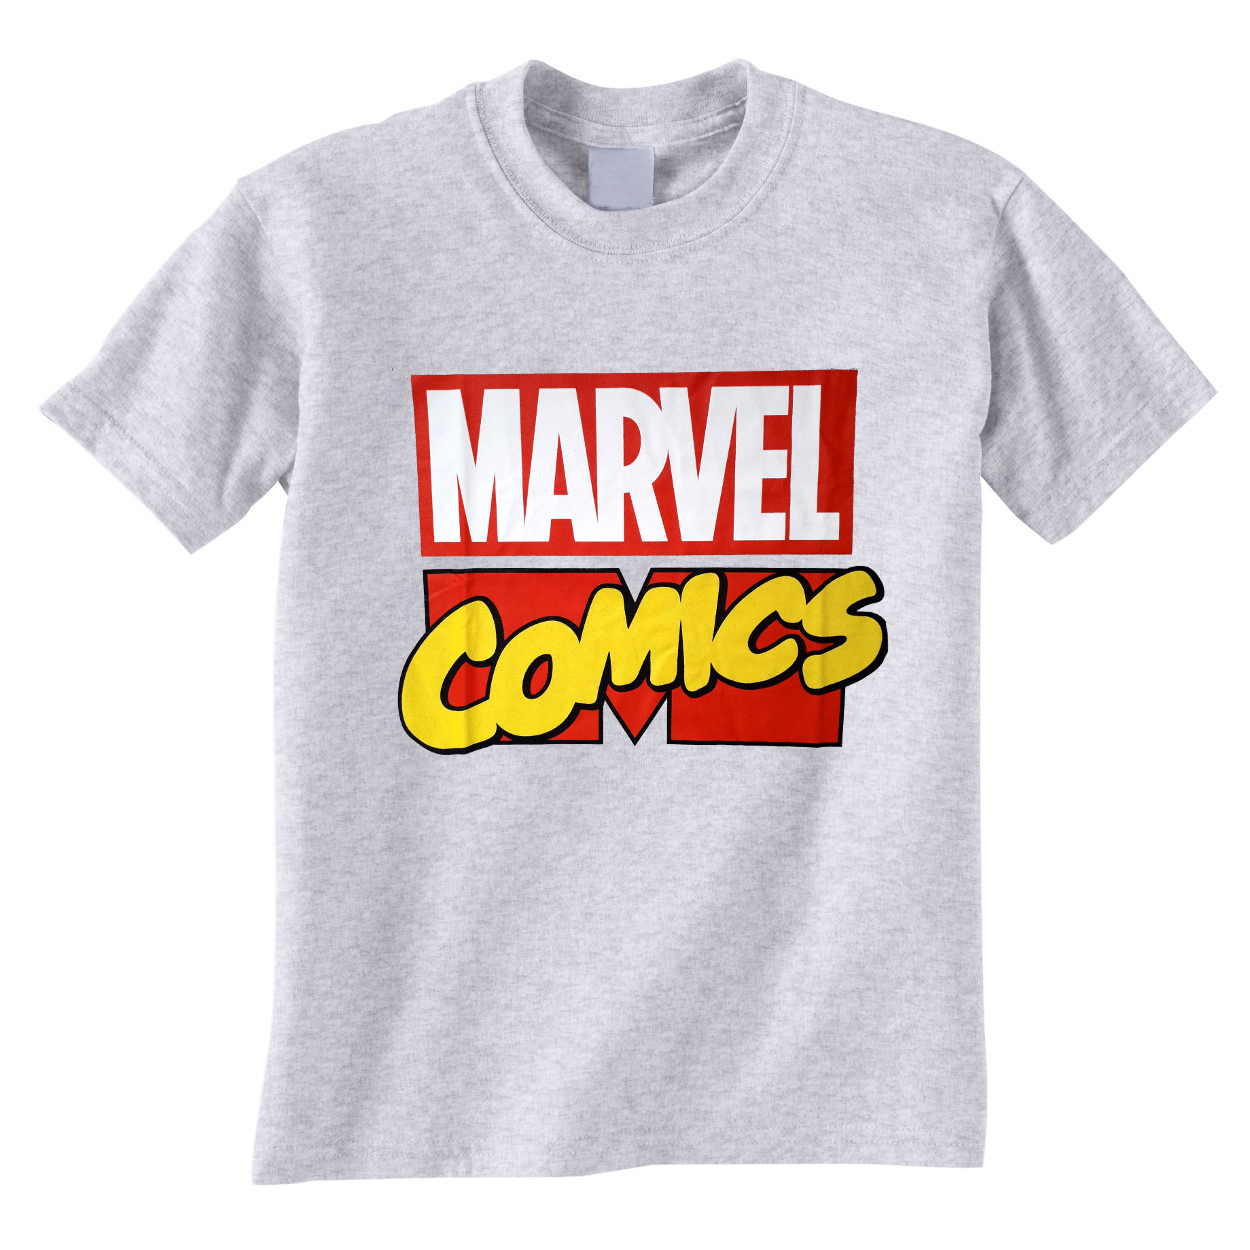 c6866575a Koszulka MARVEL COMICS logo komiks z nadrukiem KOSZULKI Z NADRUKIEM ...